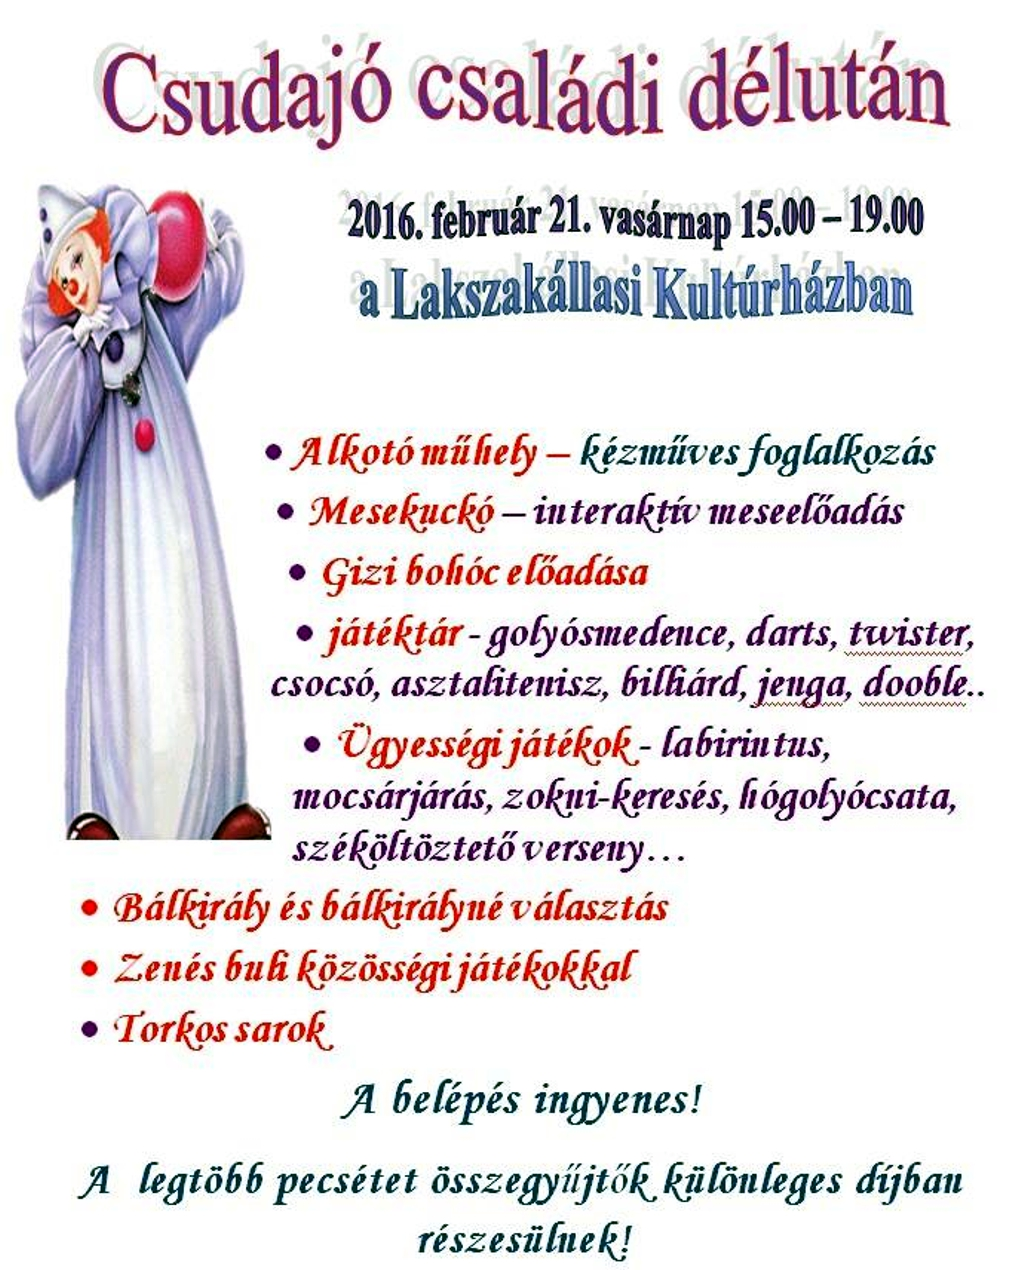 lakszakallas-csaladi-delutan-2016